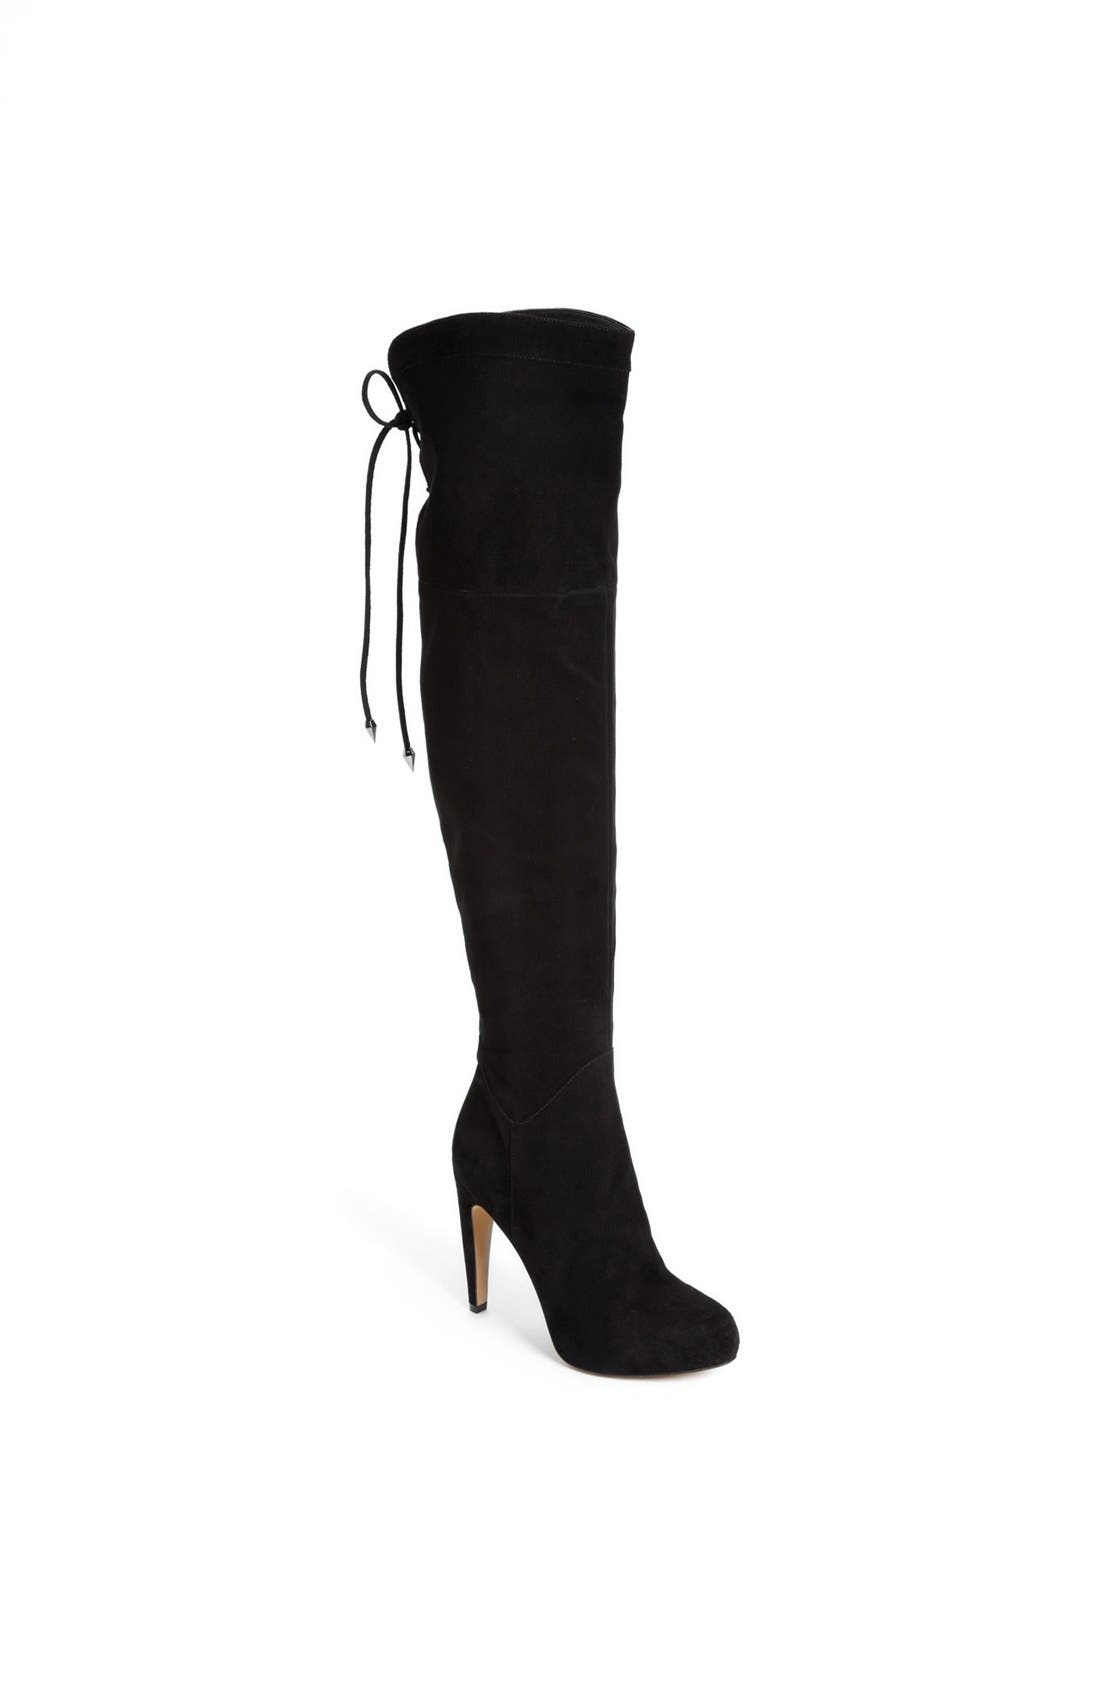 Alternate Image 1 Selected - Sam Edelman 'Kayla' Over the Knee Boot (Women) (Online Only)